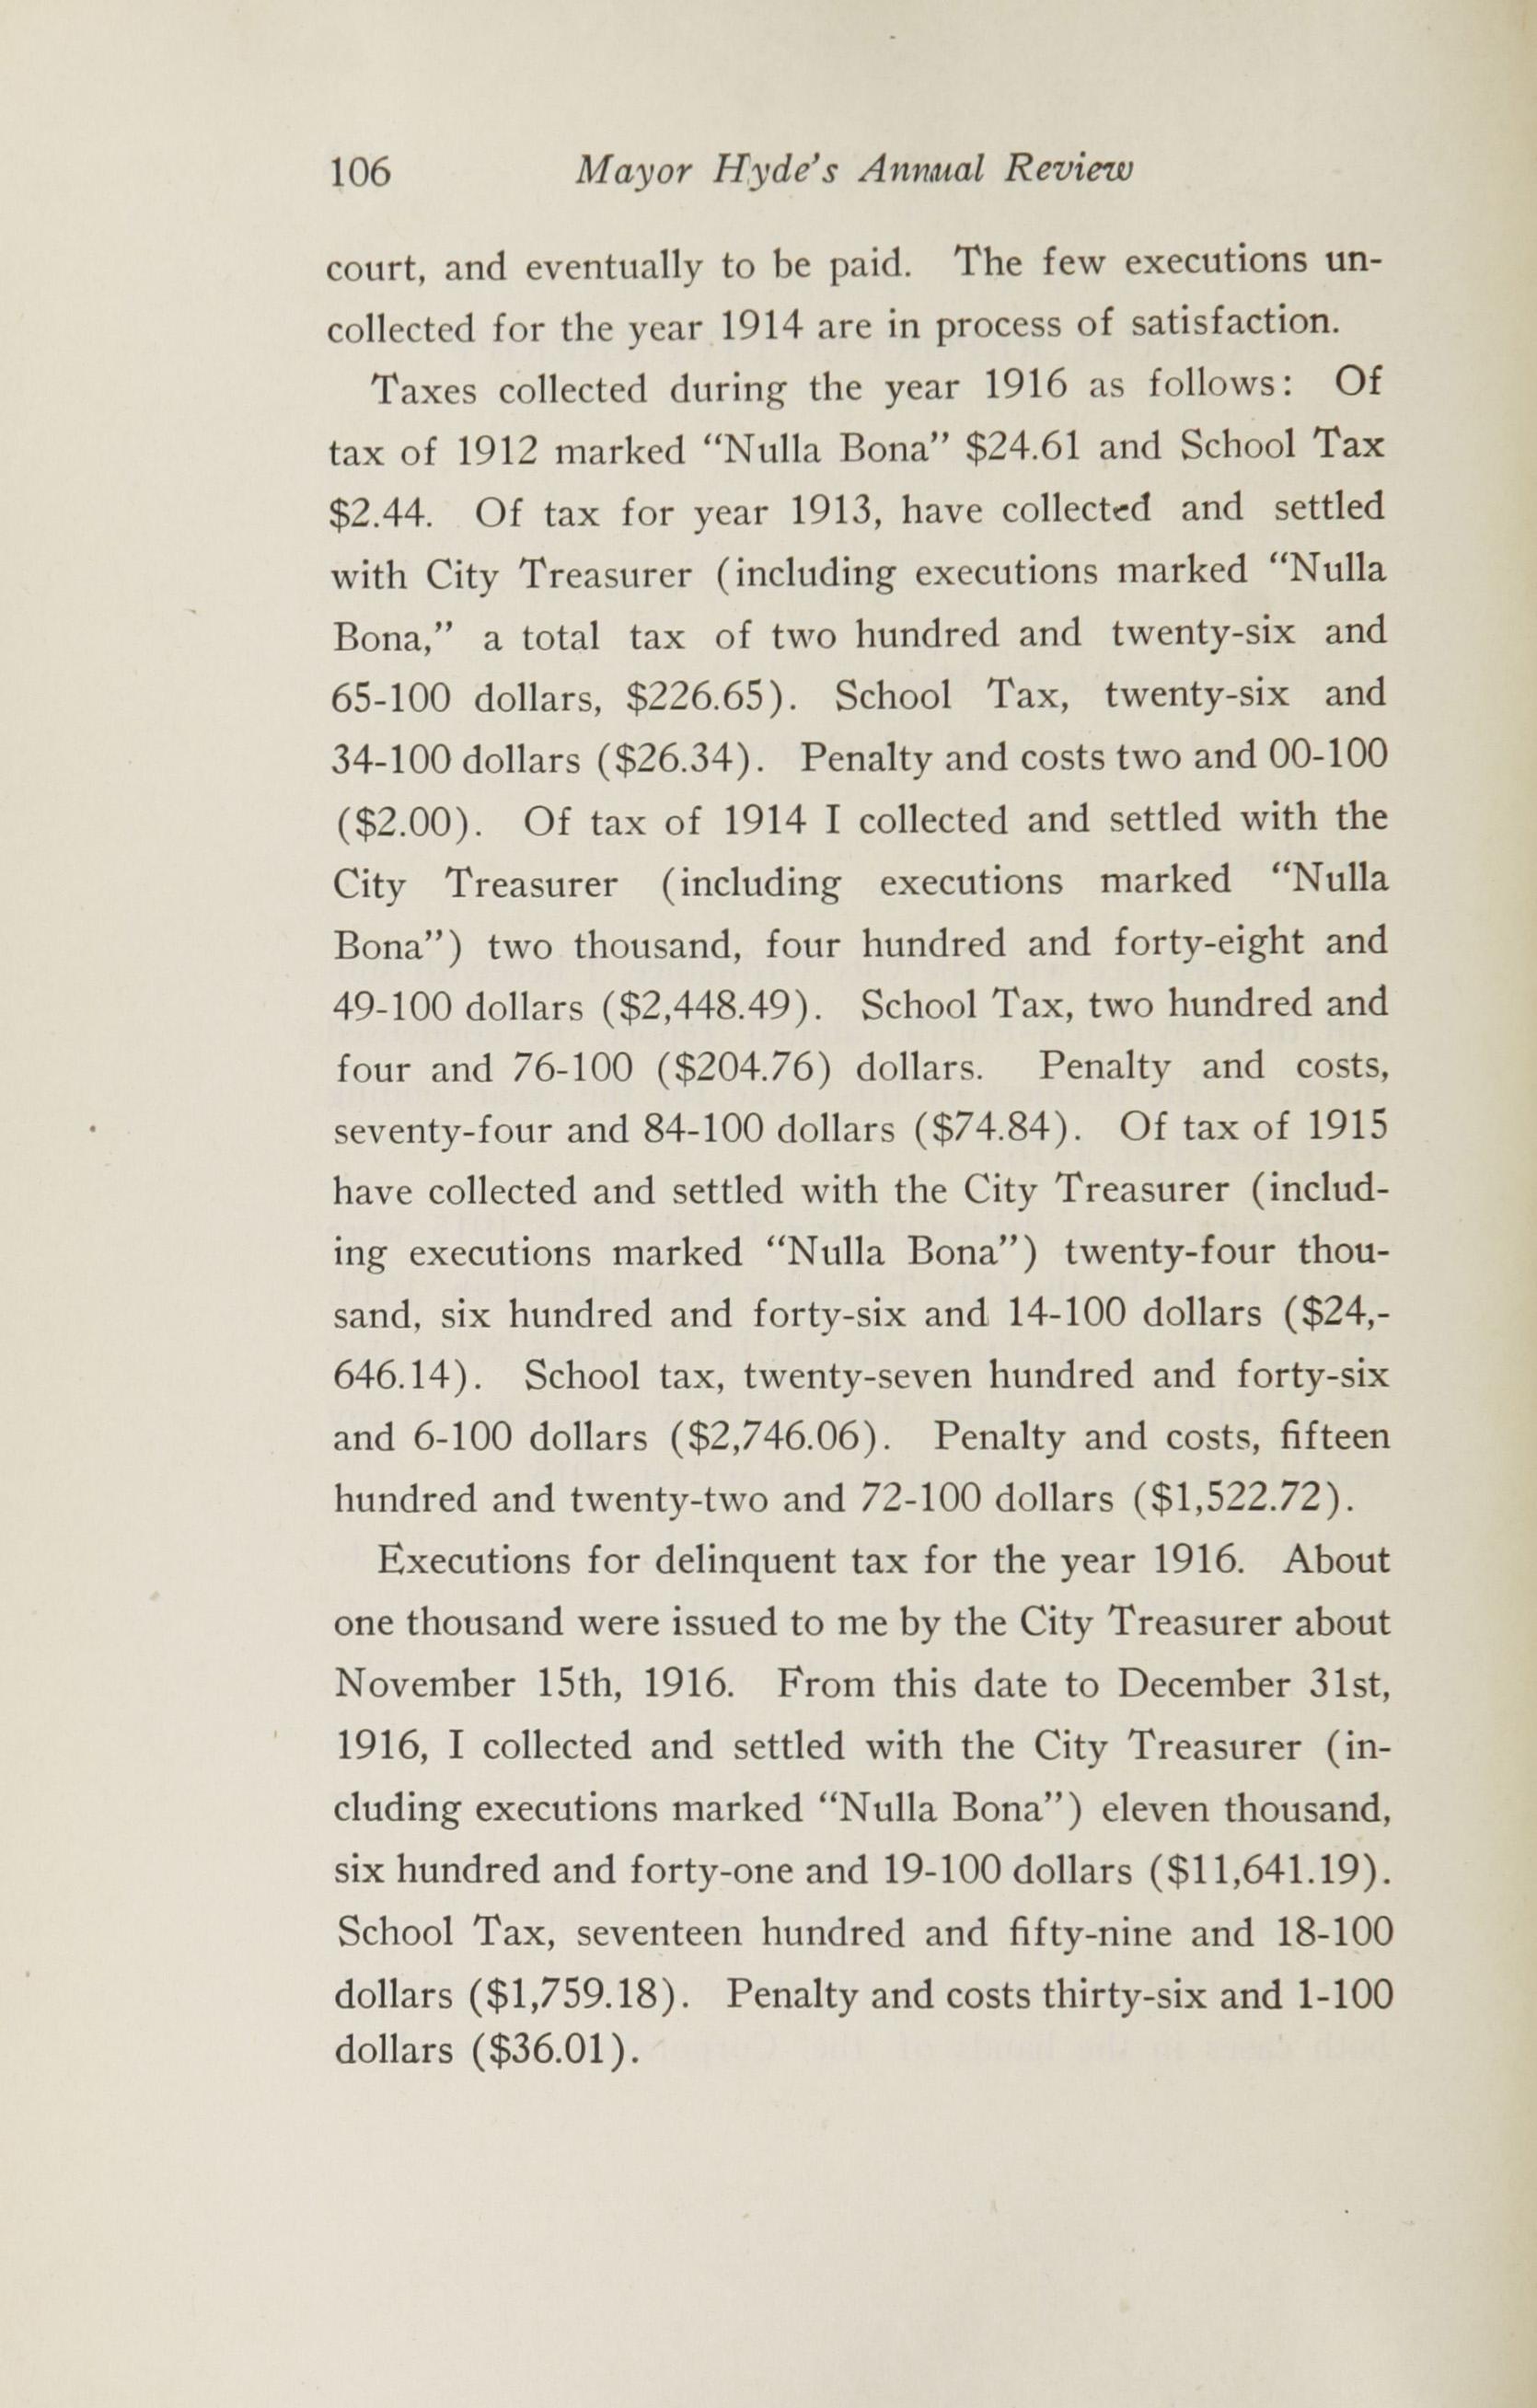 Charleston Yearbook, 1916, page 106